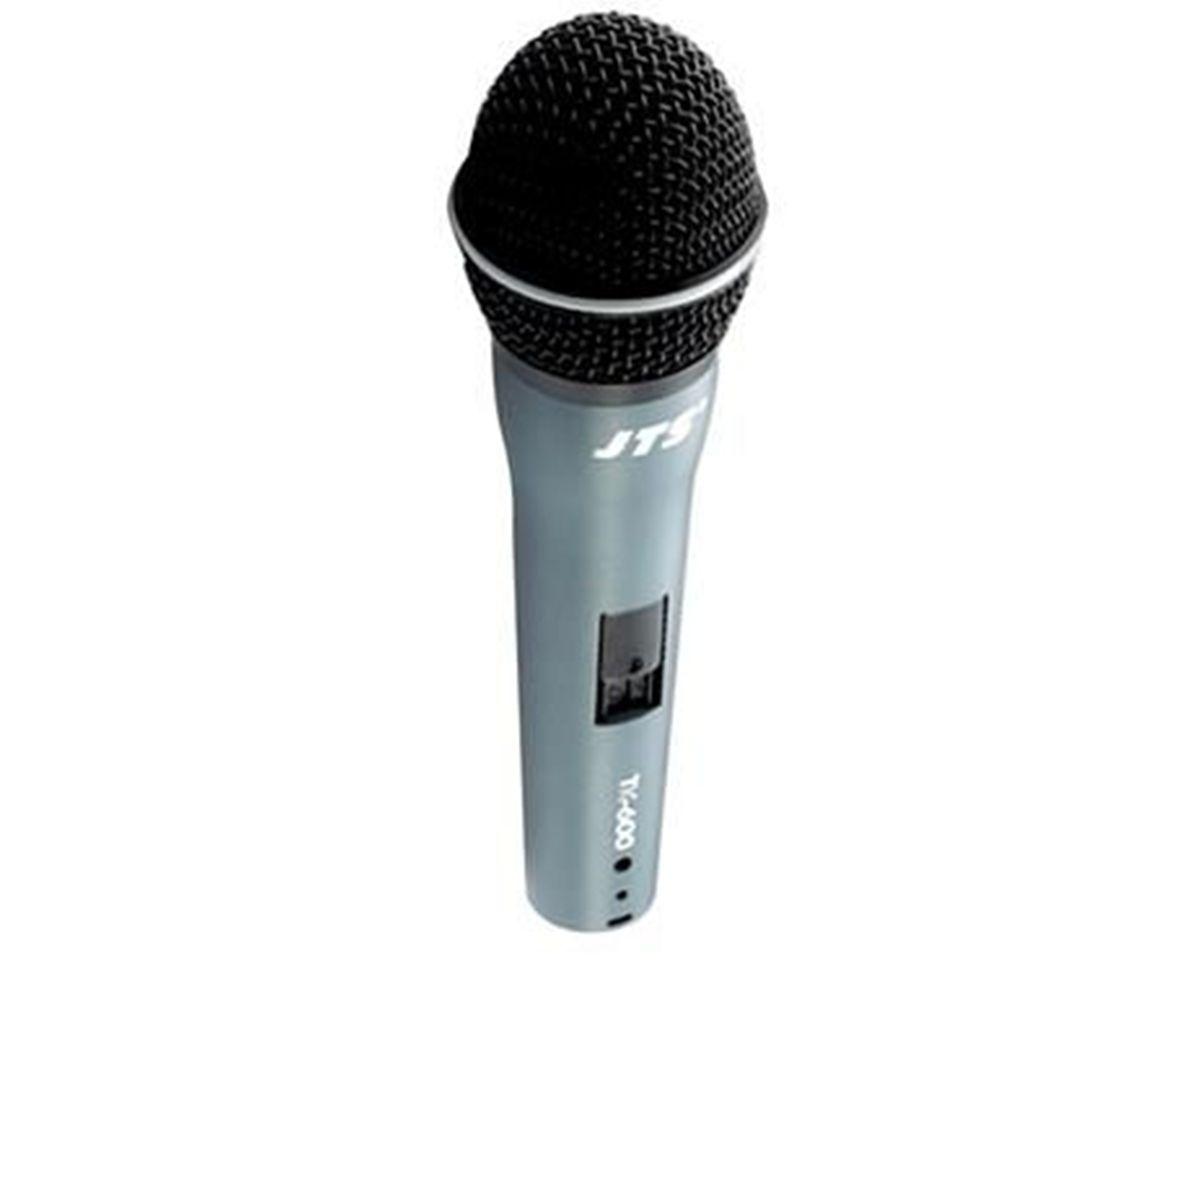 Microfone com Fio JTS TK-600